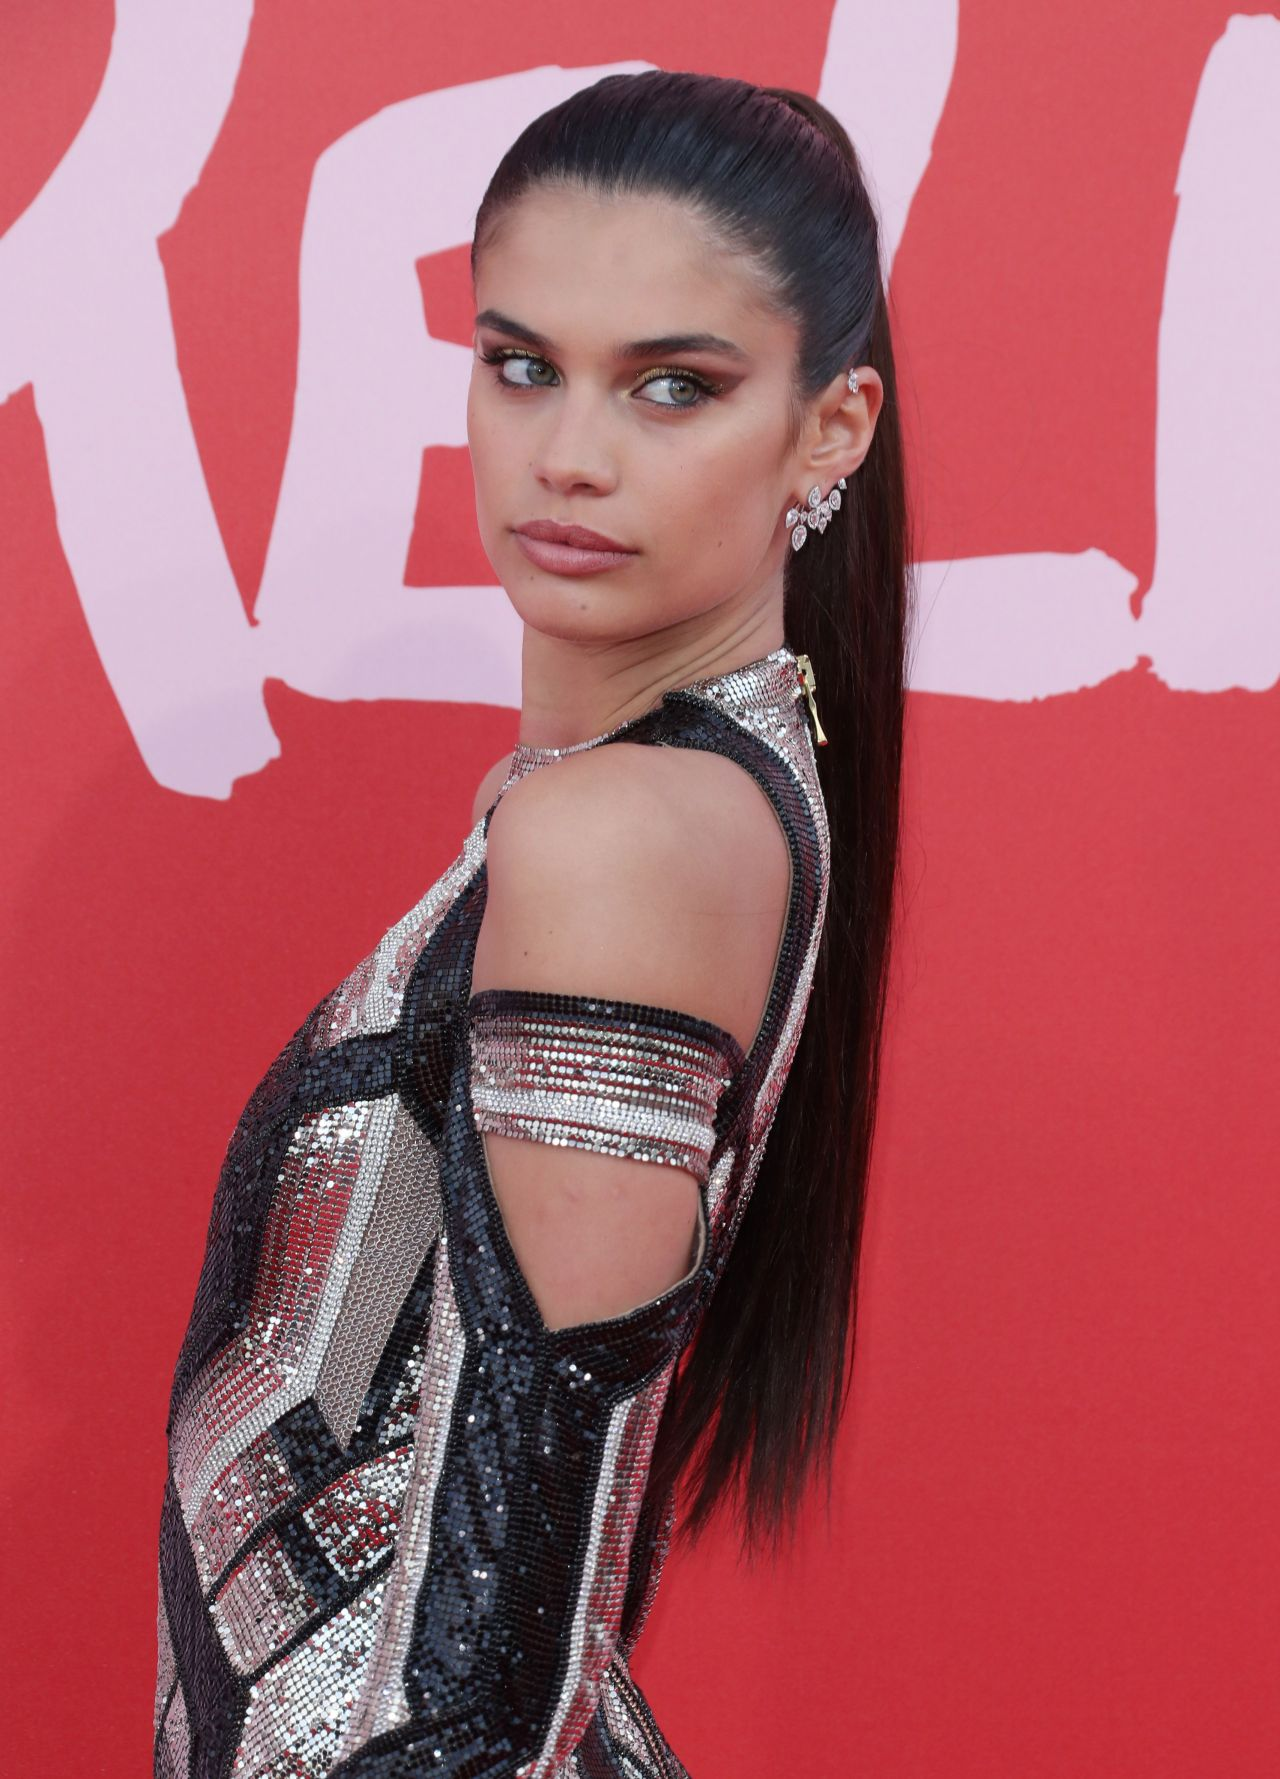 Sara Sampaio U2013 Fashion For Relief U2013 Cannes Film Festival